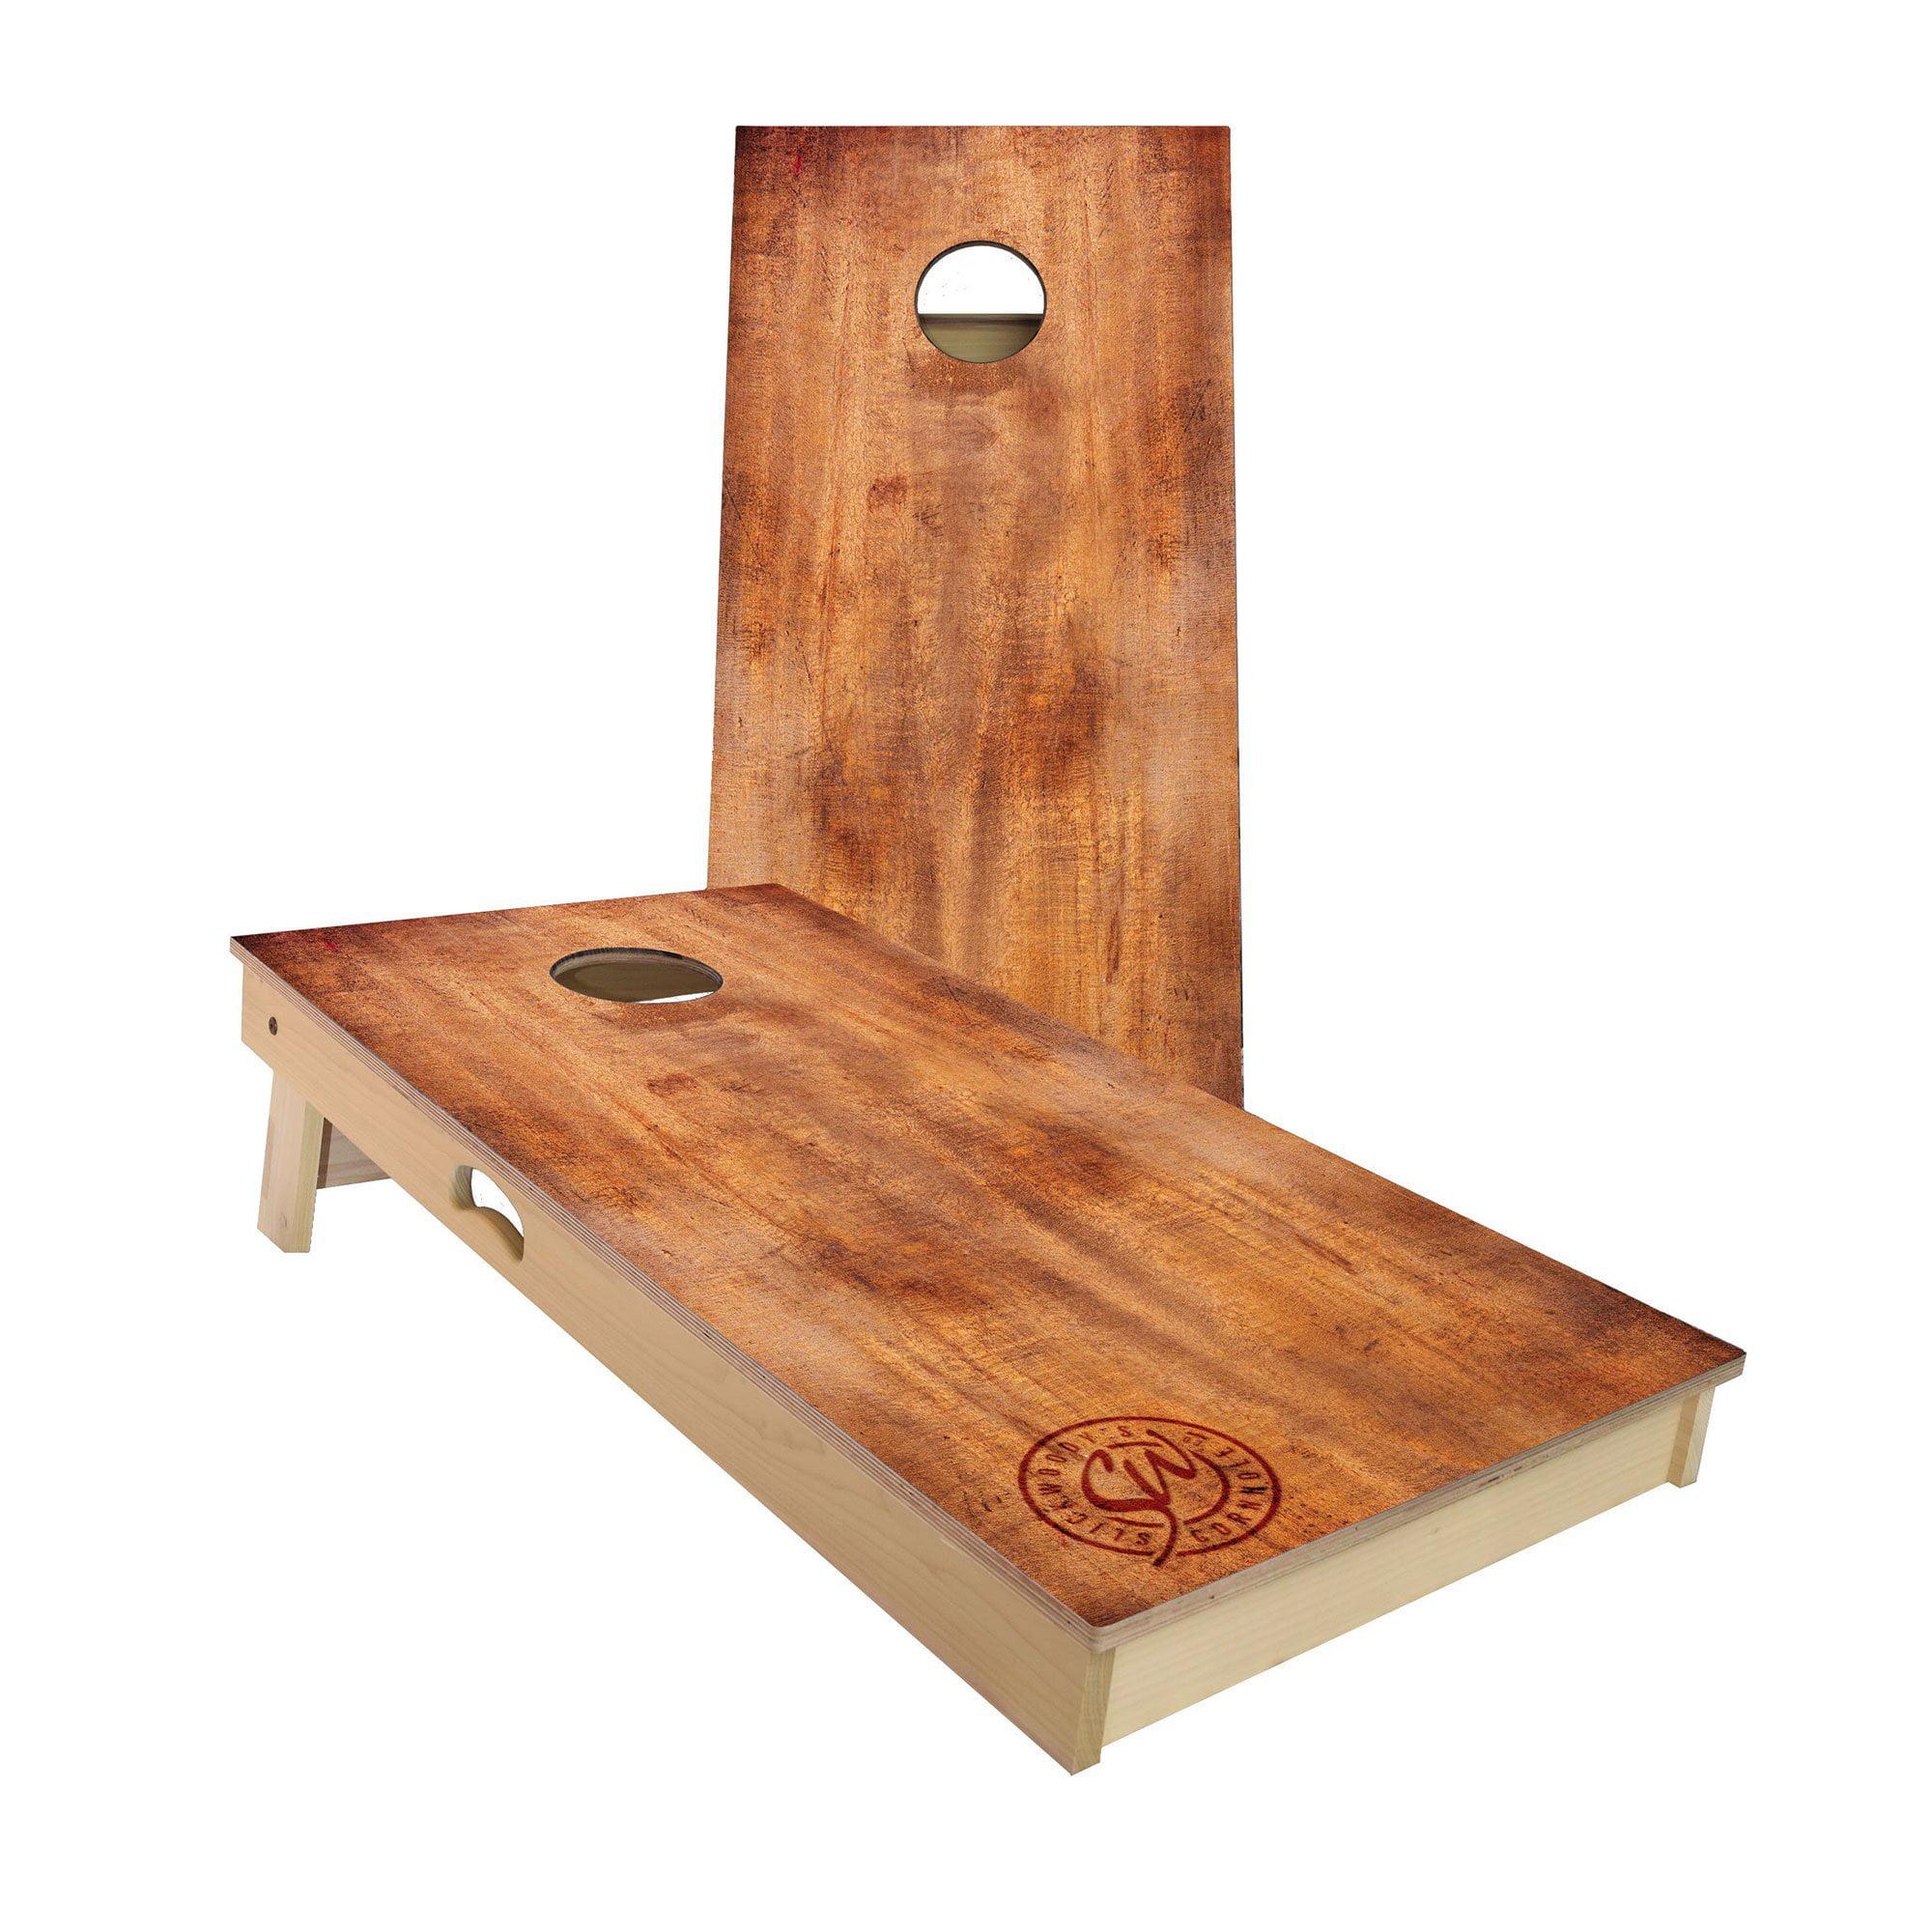 Slick Woody's Burnt Wood Regulation Size Cornhole Board Beanbag Toss Game Set by Slick Woody's Cornhole Co.